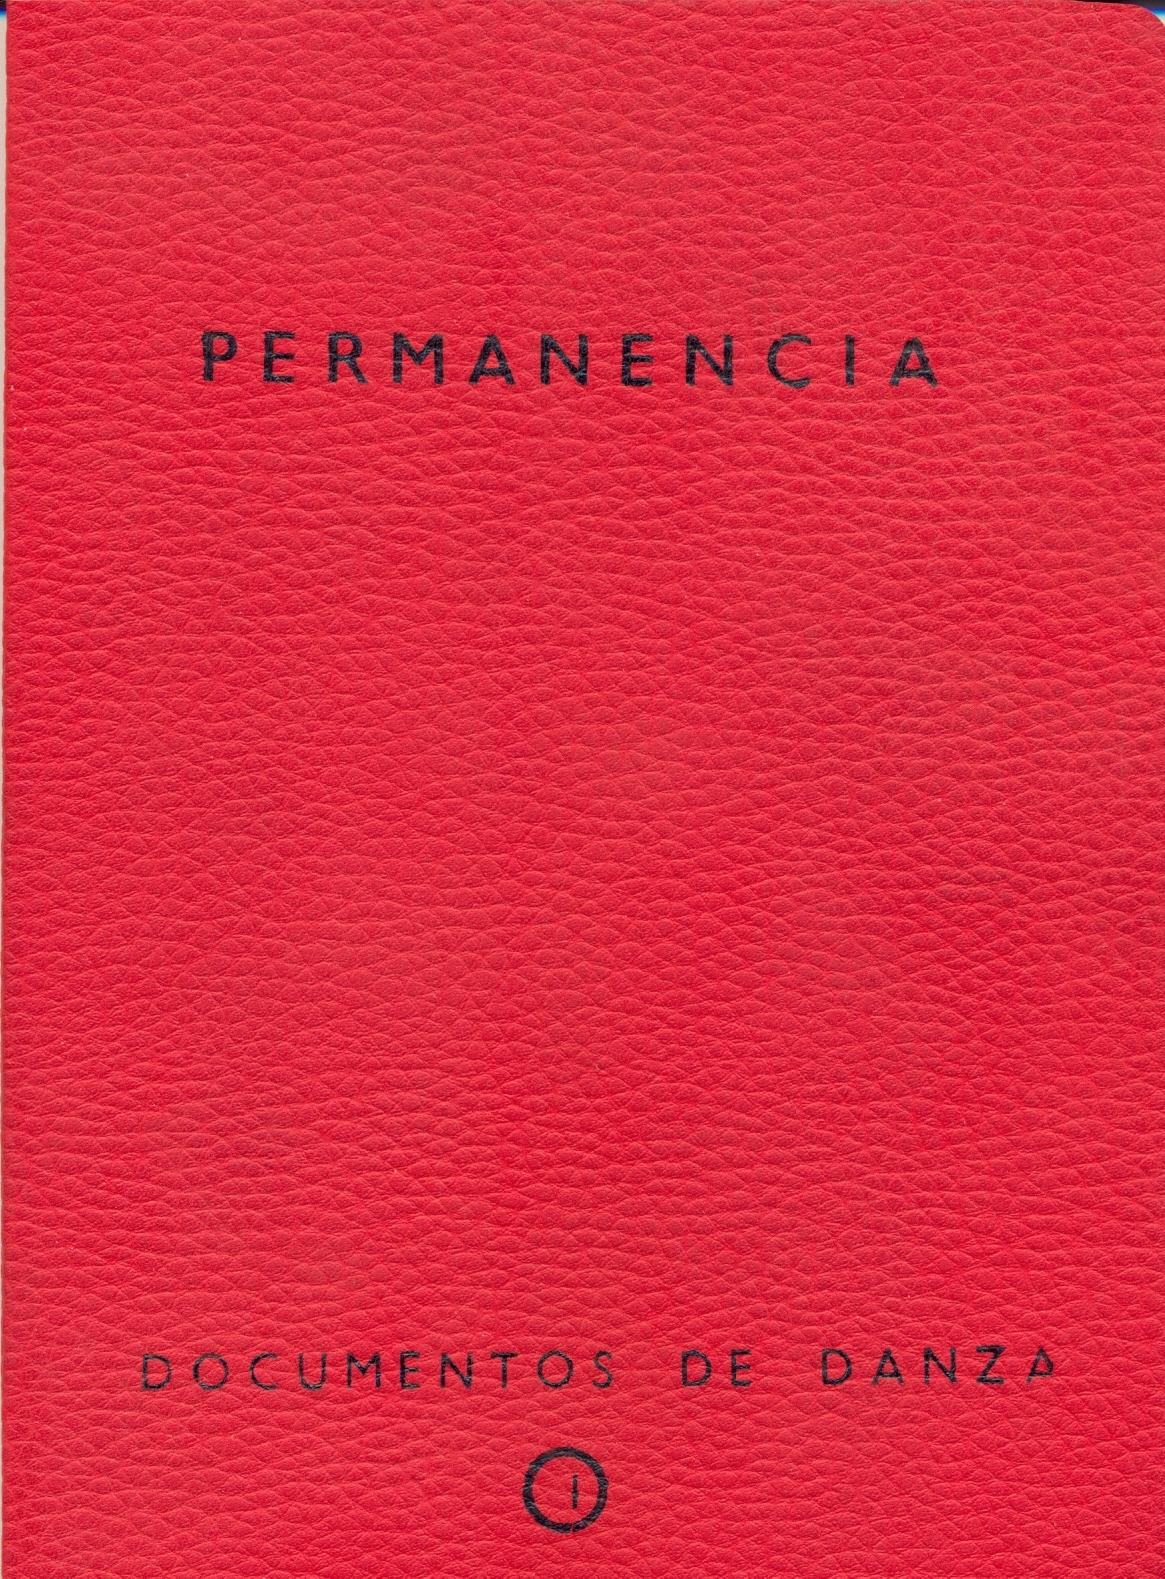 PERMANENCIA. DOCUMENTOS DE DANZA